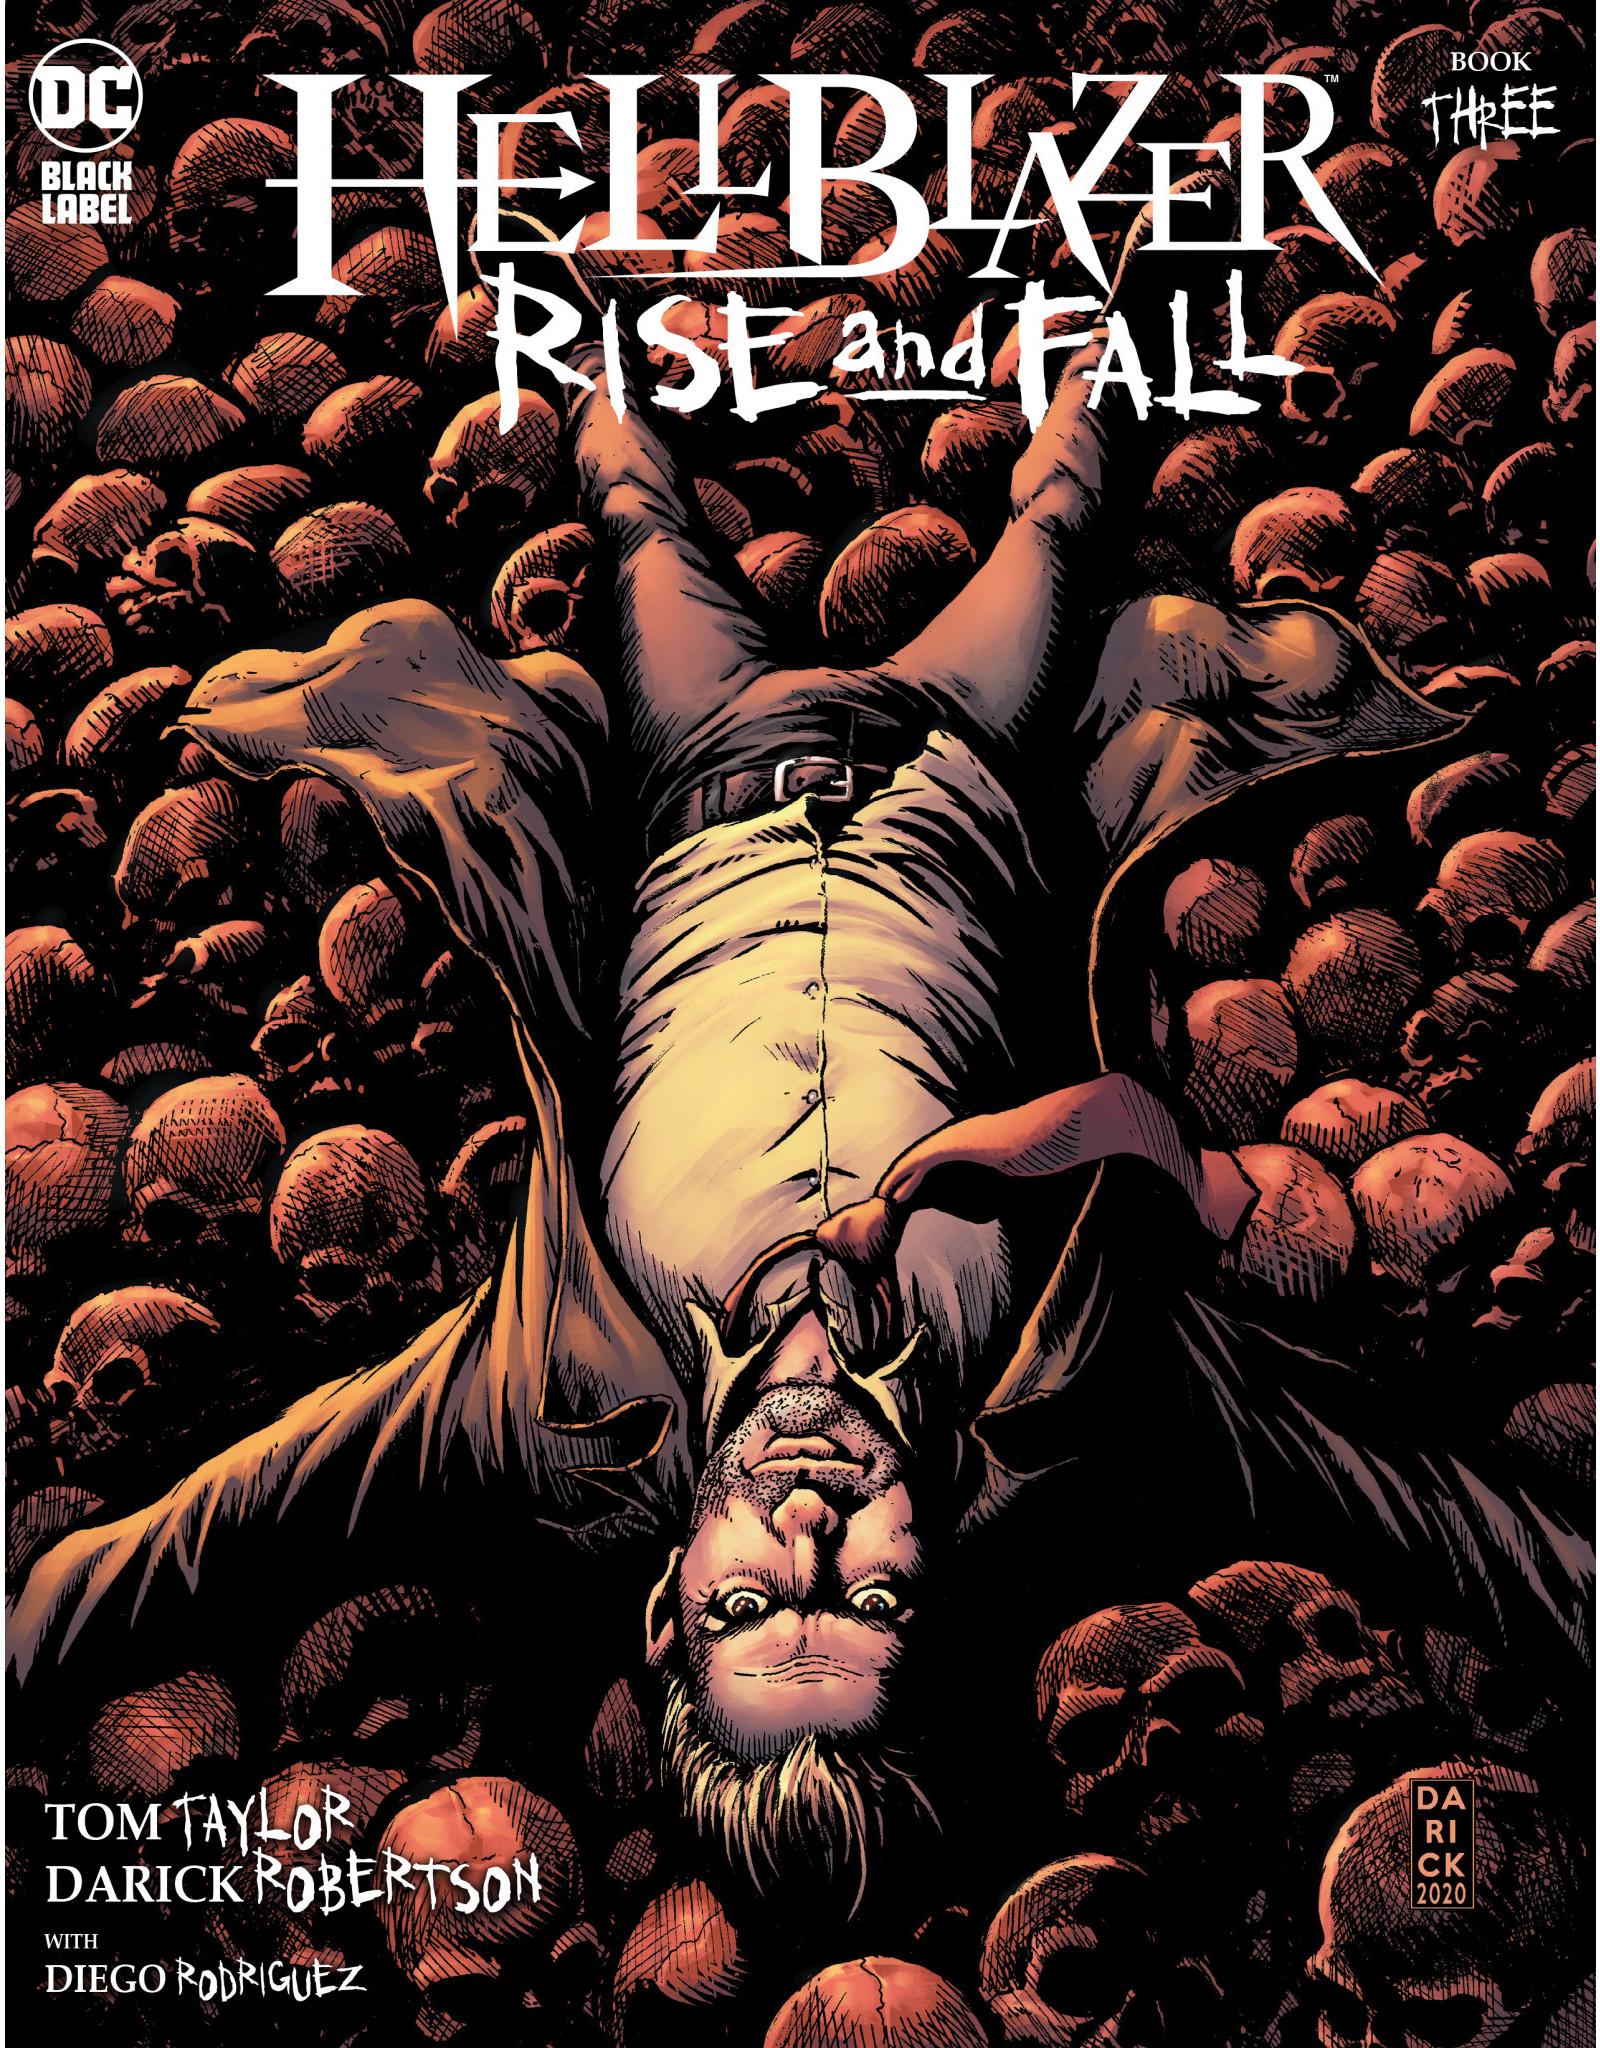 DC Comics HELLBLAZER RISE AND FALL #3 (OF 3) CVR A DARICK ROBERTSON (MR)